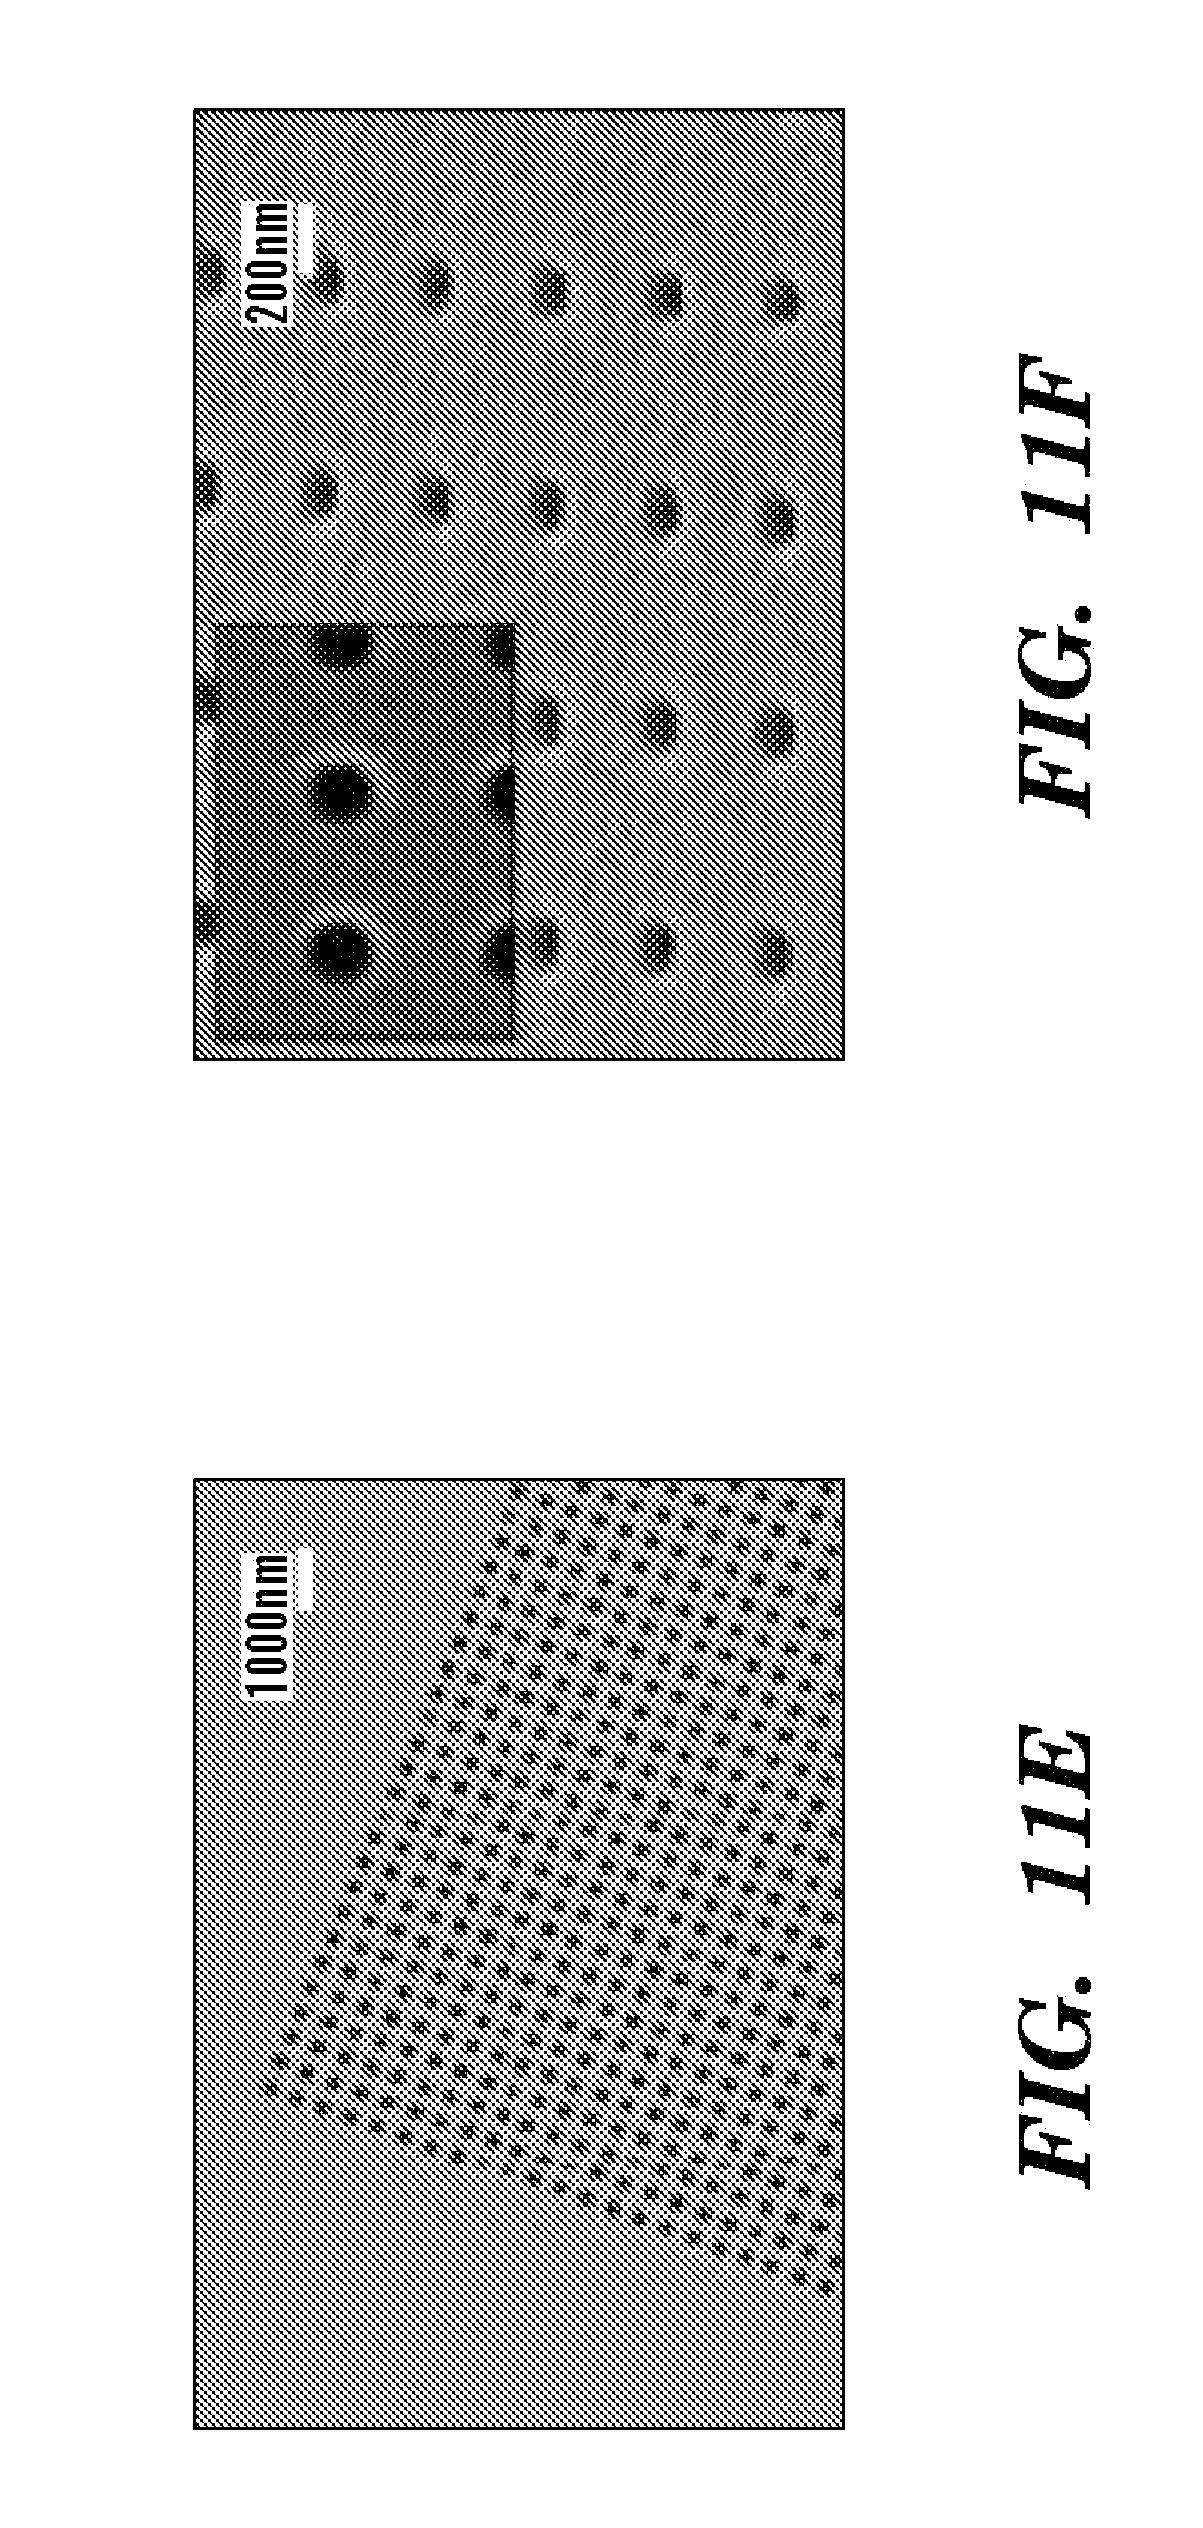 nanostructure optical biosensors Nanostructured materials for optical biosensing upm-isom 2- nanopillar array biosensors 21 su-8 nanopillars we have fabricated periodic lattices of su-8 resist nano-pillars on both.